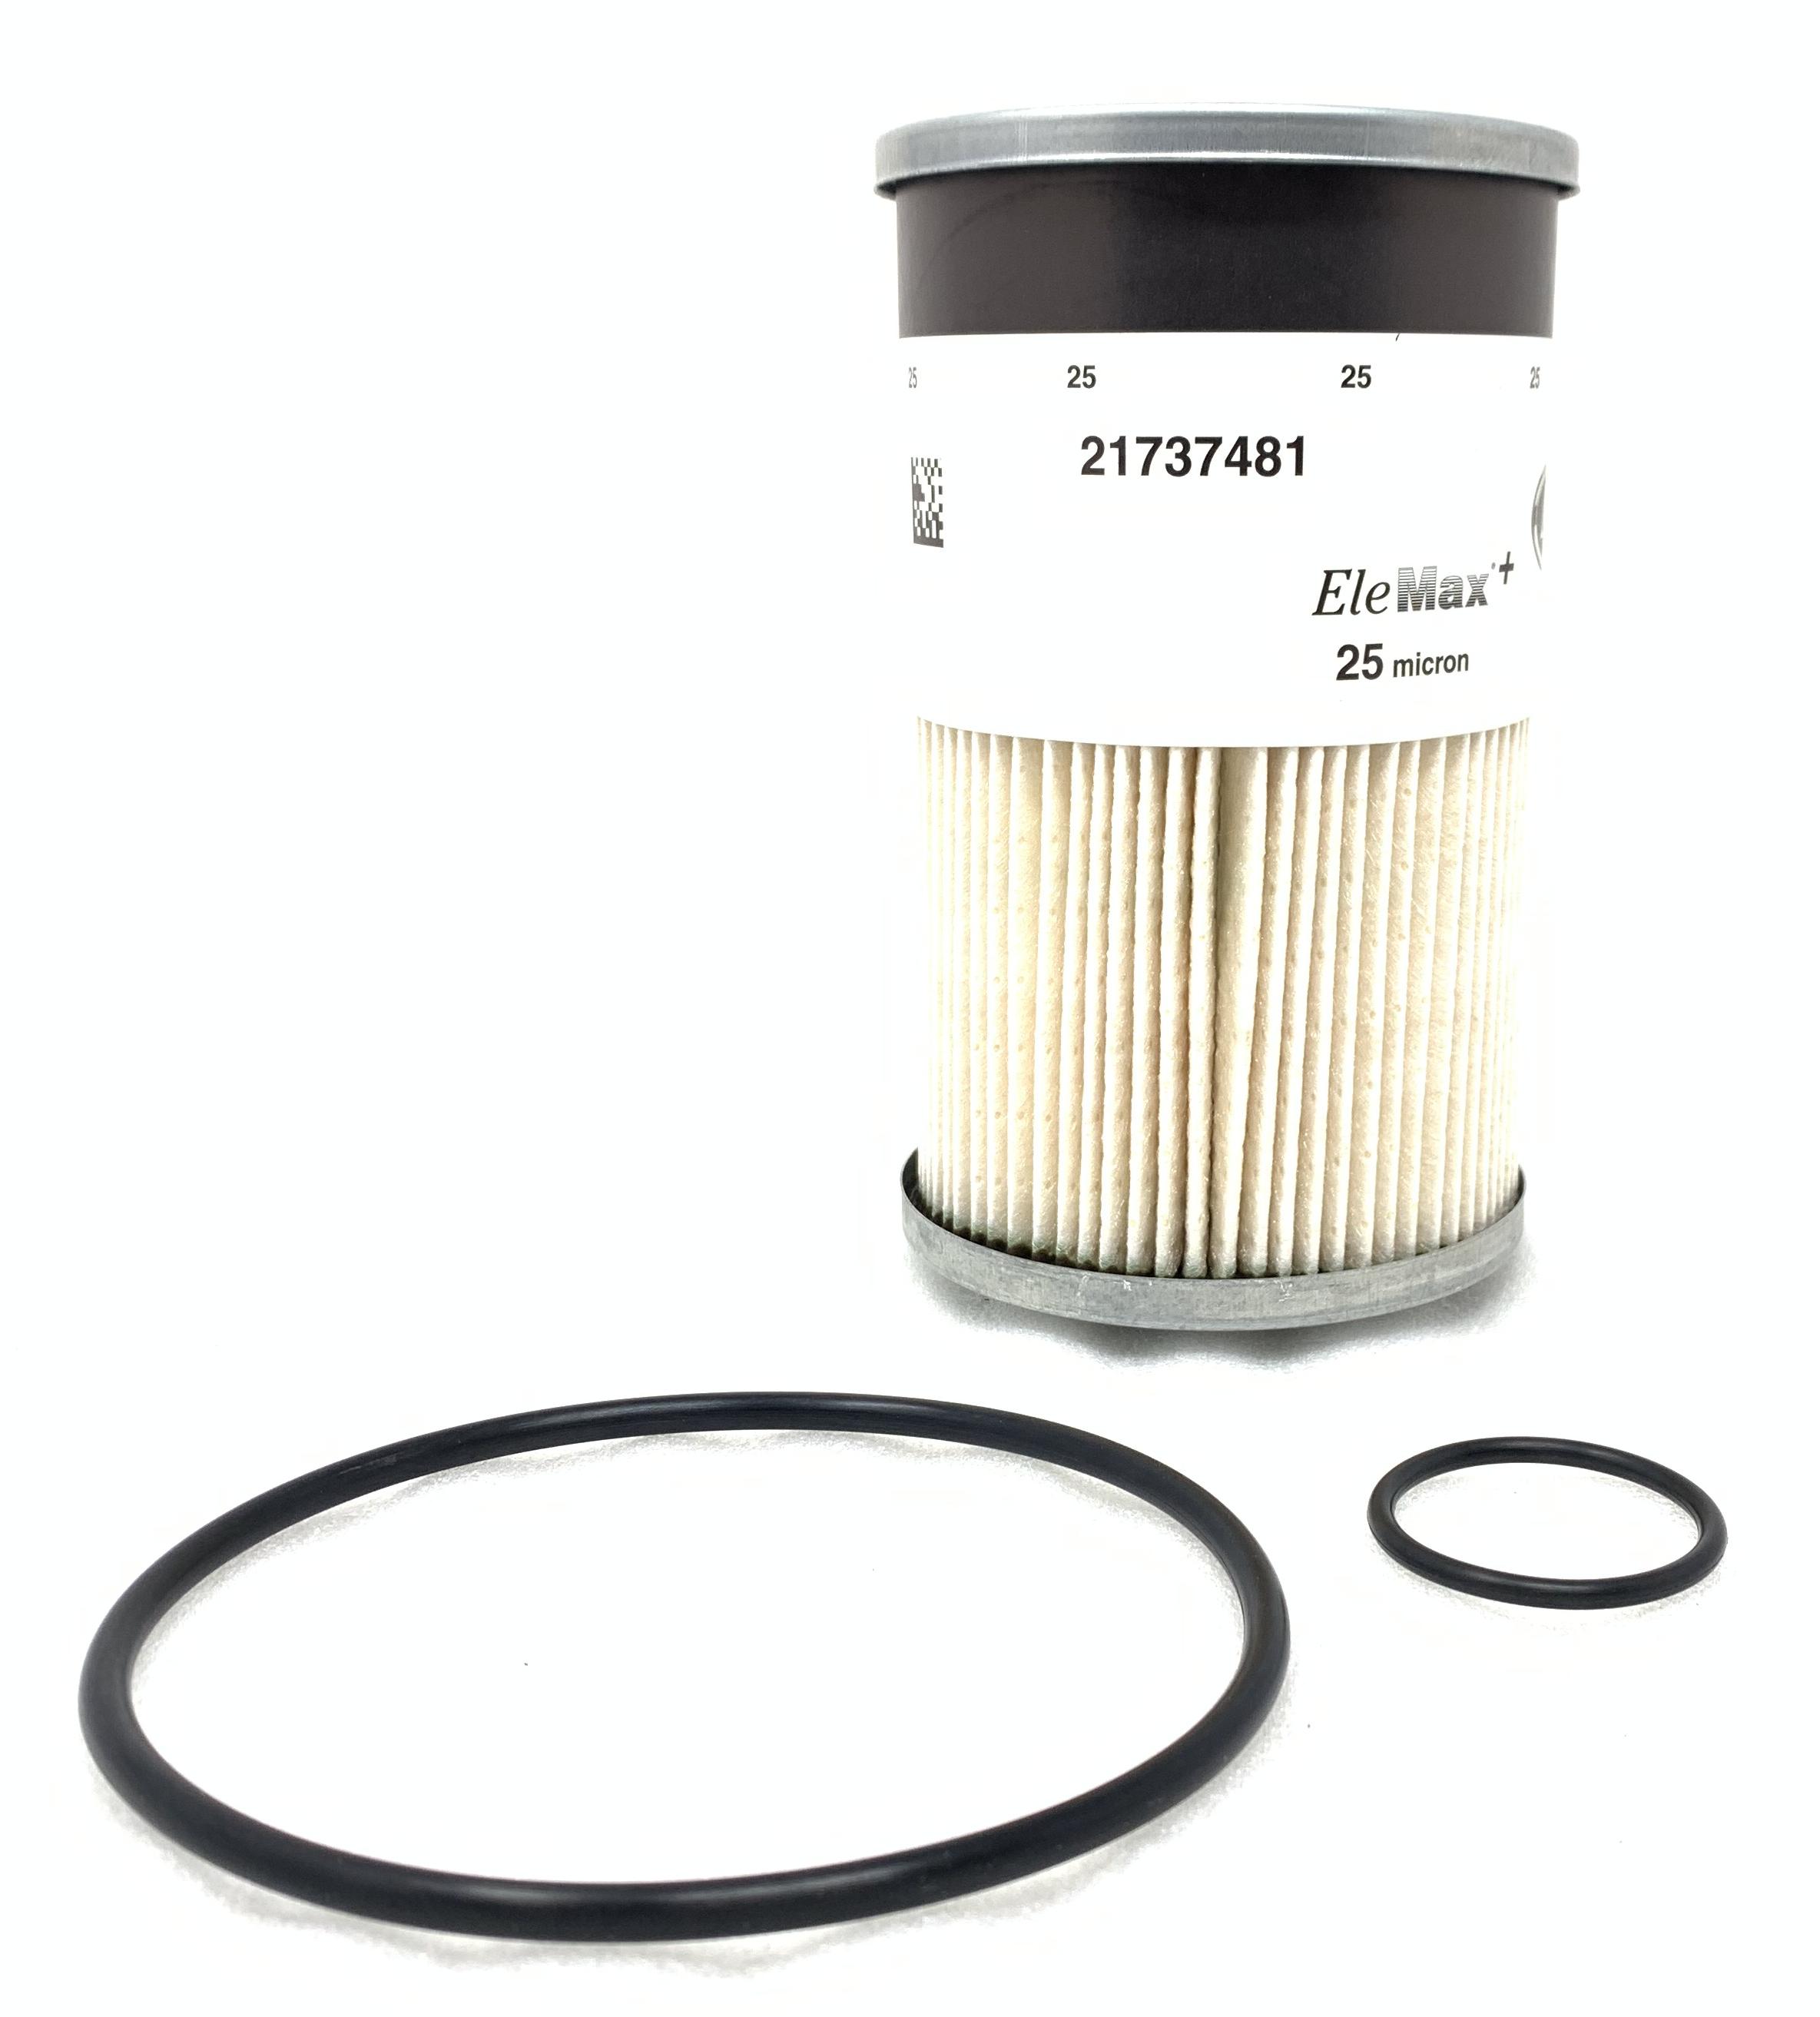 [SCHEMATICS_4NL]  Fuel Filter Insert 21737481 | Filters | Mack Truck Parts | Webb Fuel Filters |  | Heavy Duty Truck Parts